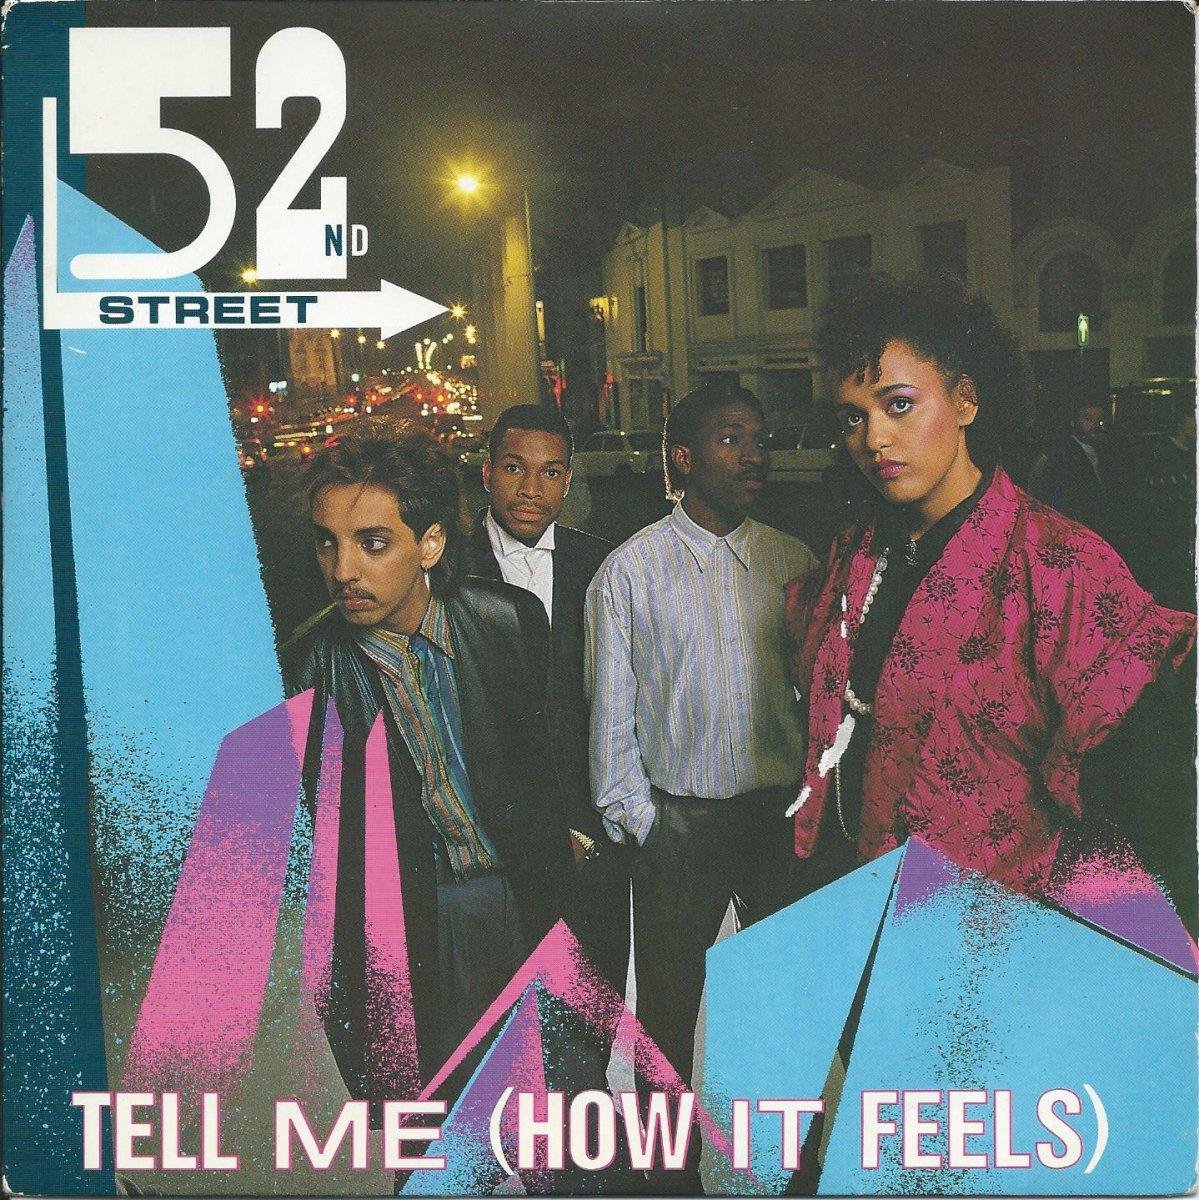 52ND STREET / TELL ME (HOW IT FEELS) (7